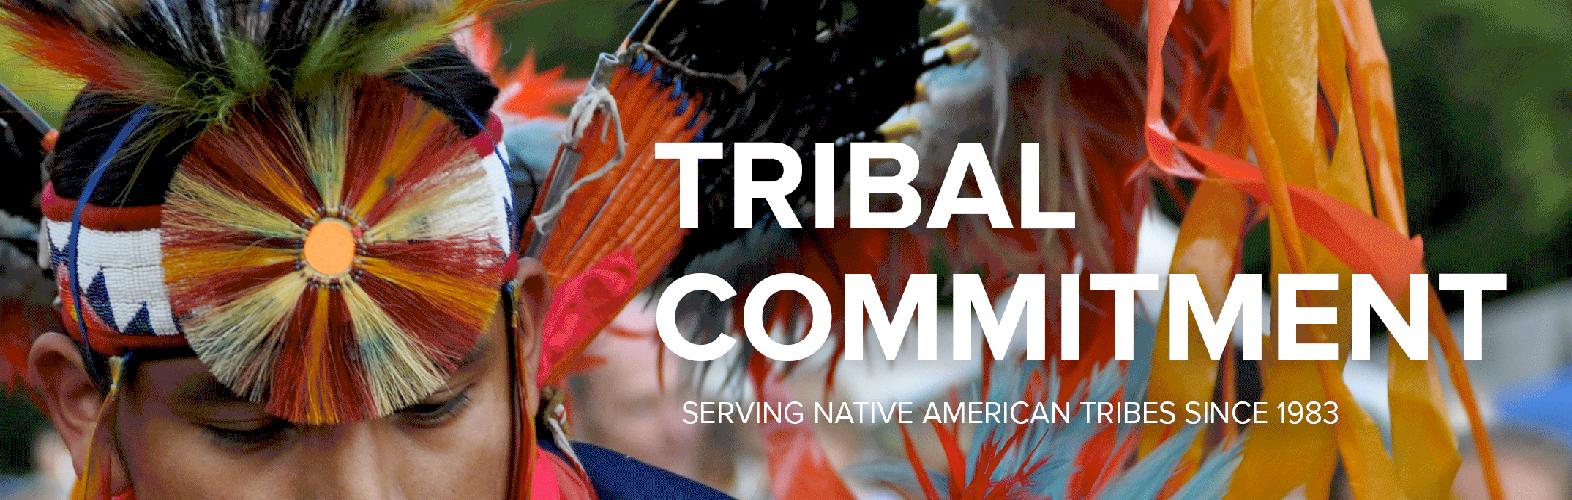 Tribal Commitment